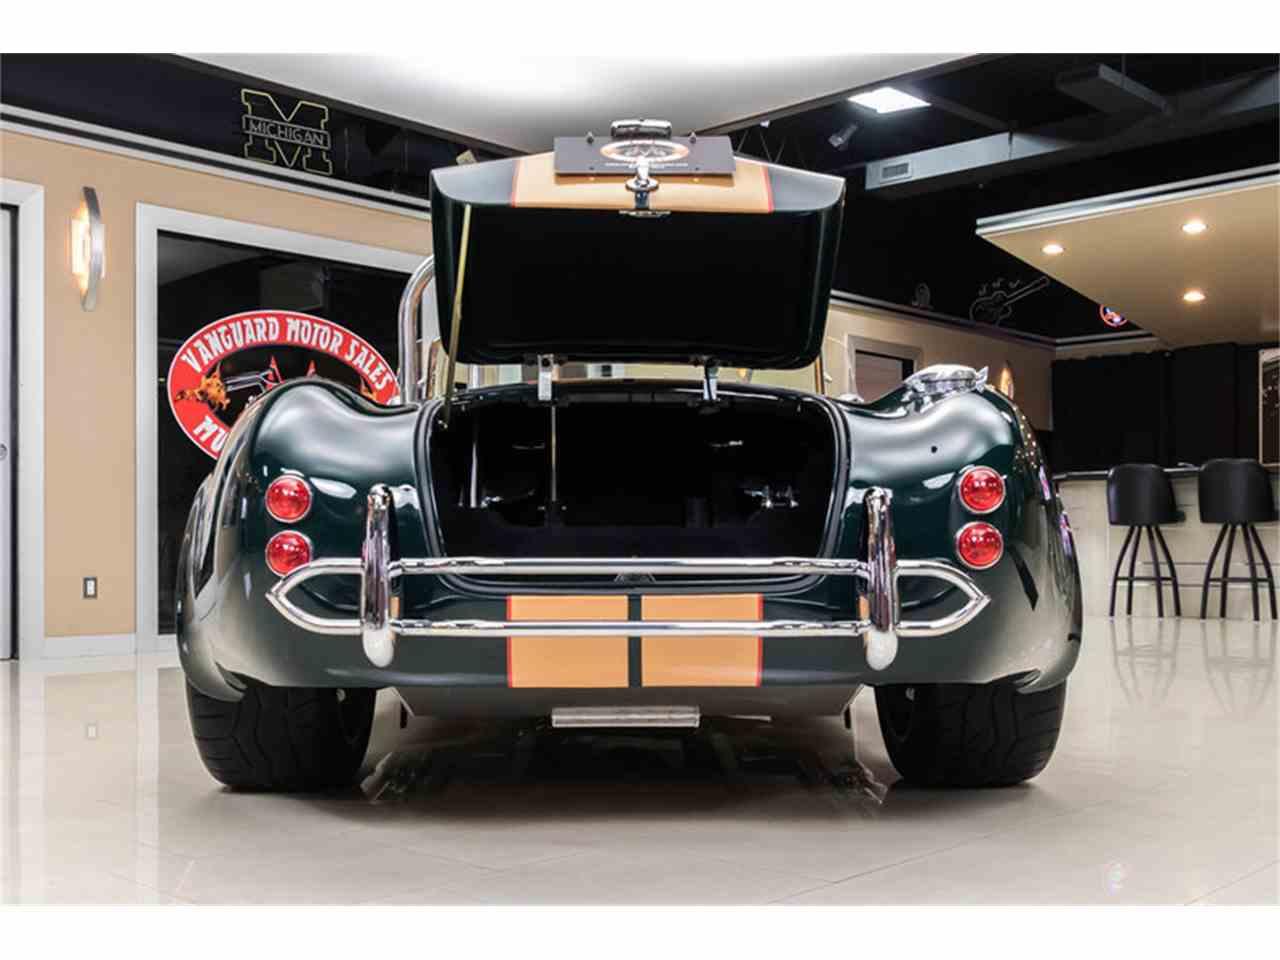 1965 Shelby Cobra Backdraft for Sale | ClassicCars.com | CC-1075512